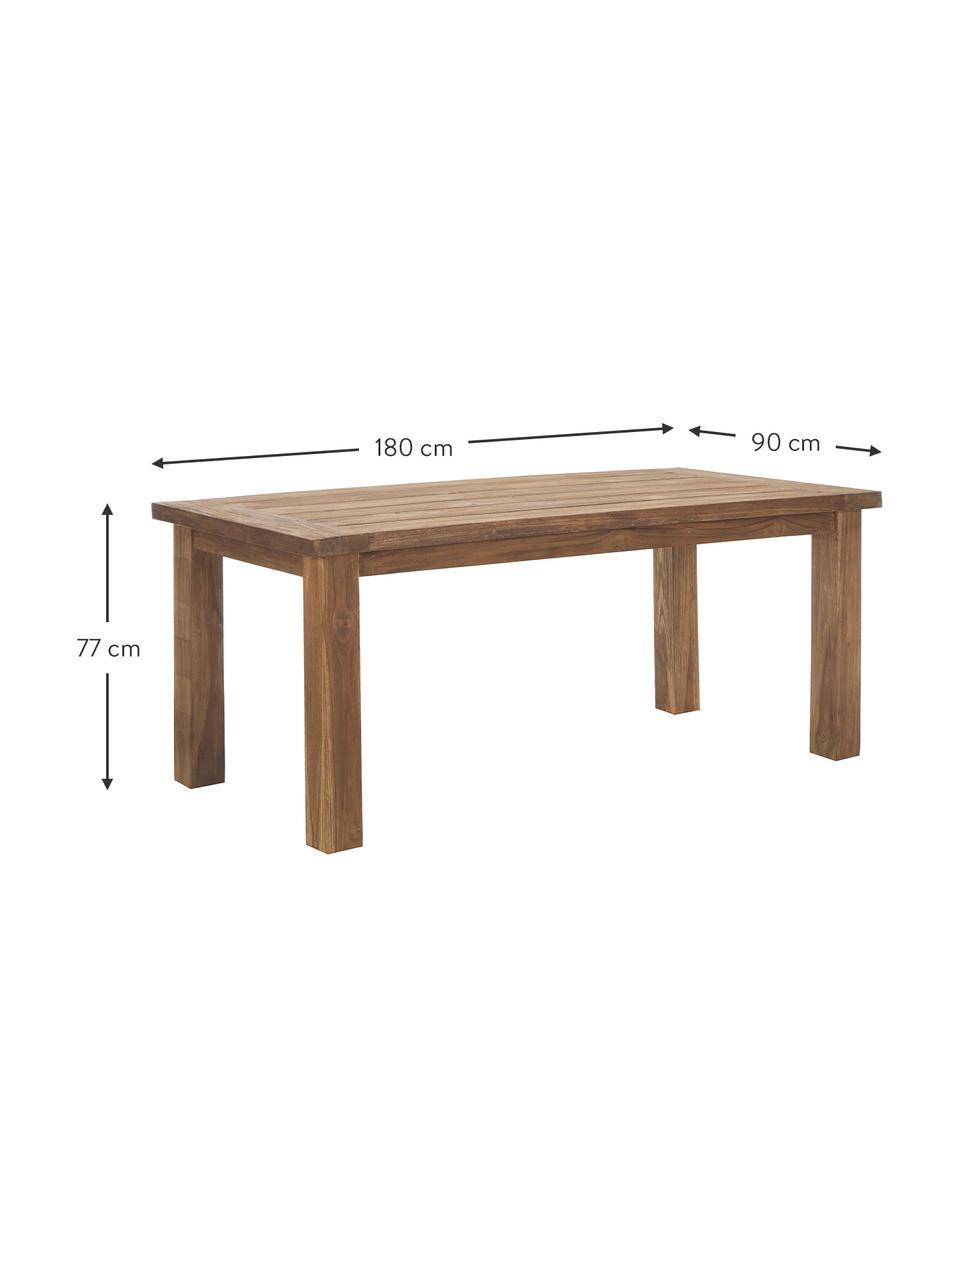 Table en bois massif Bois, Teck